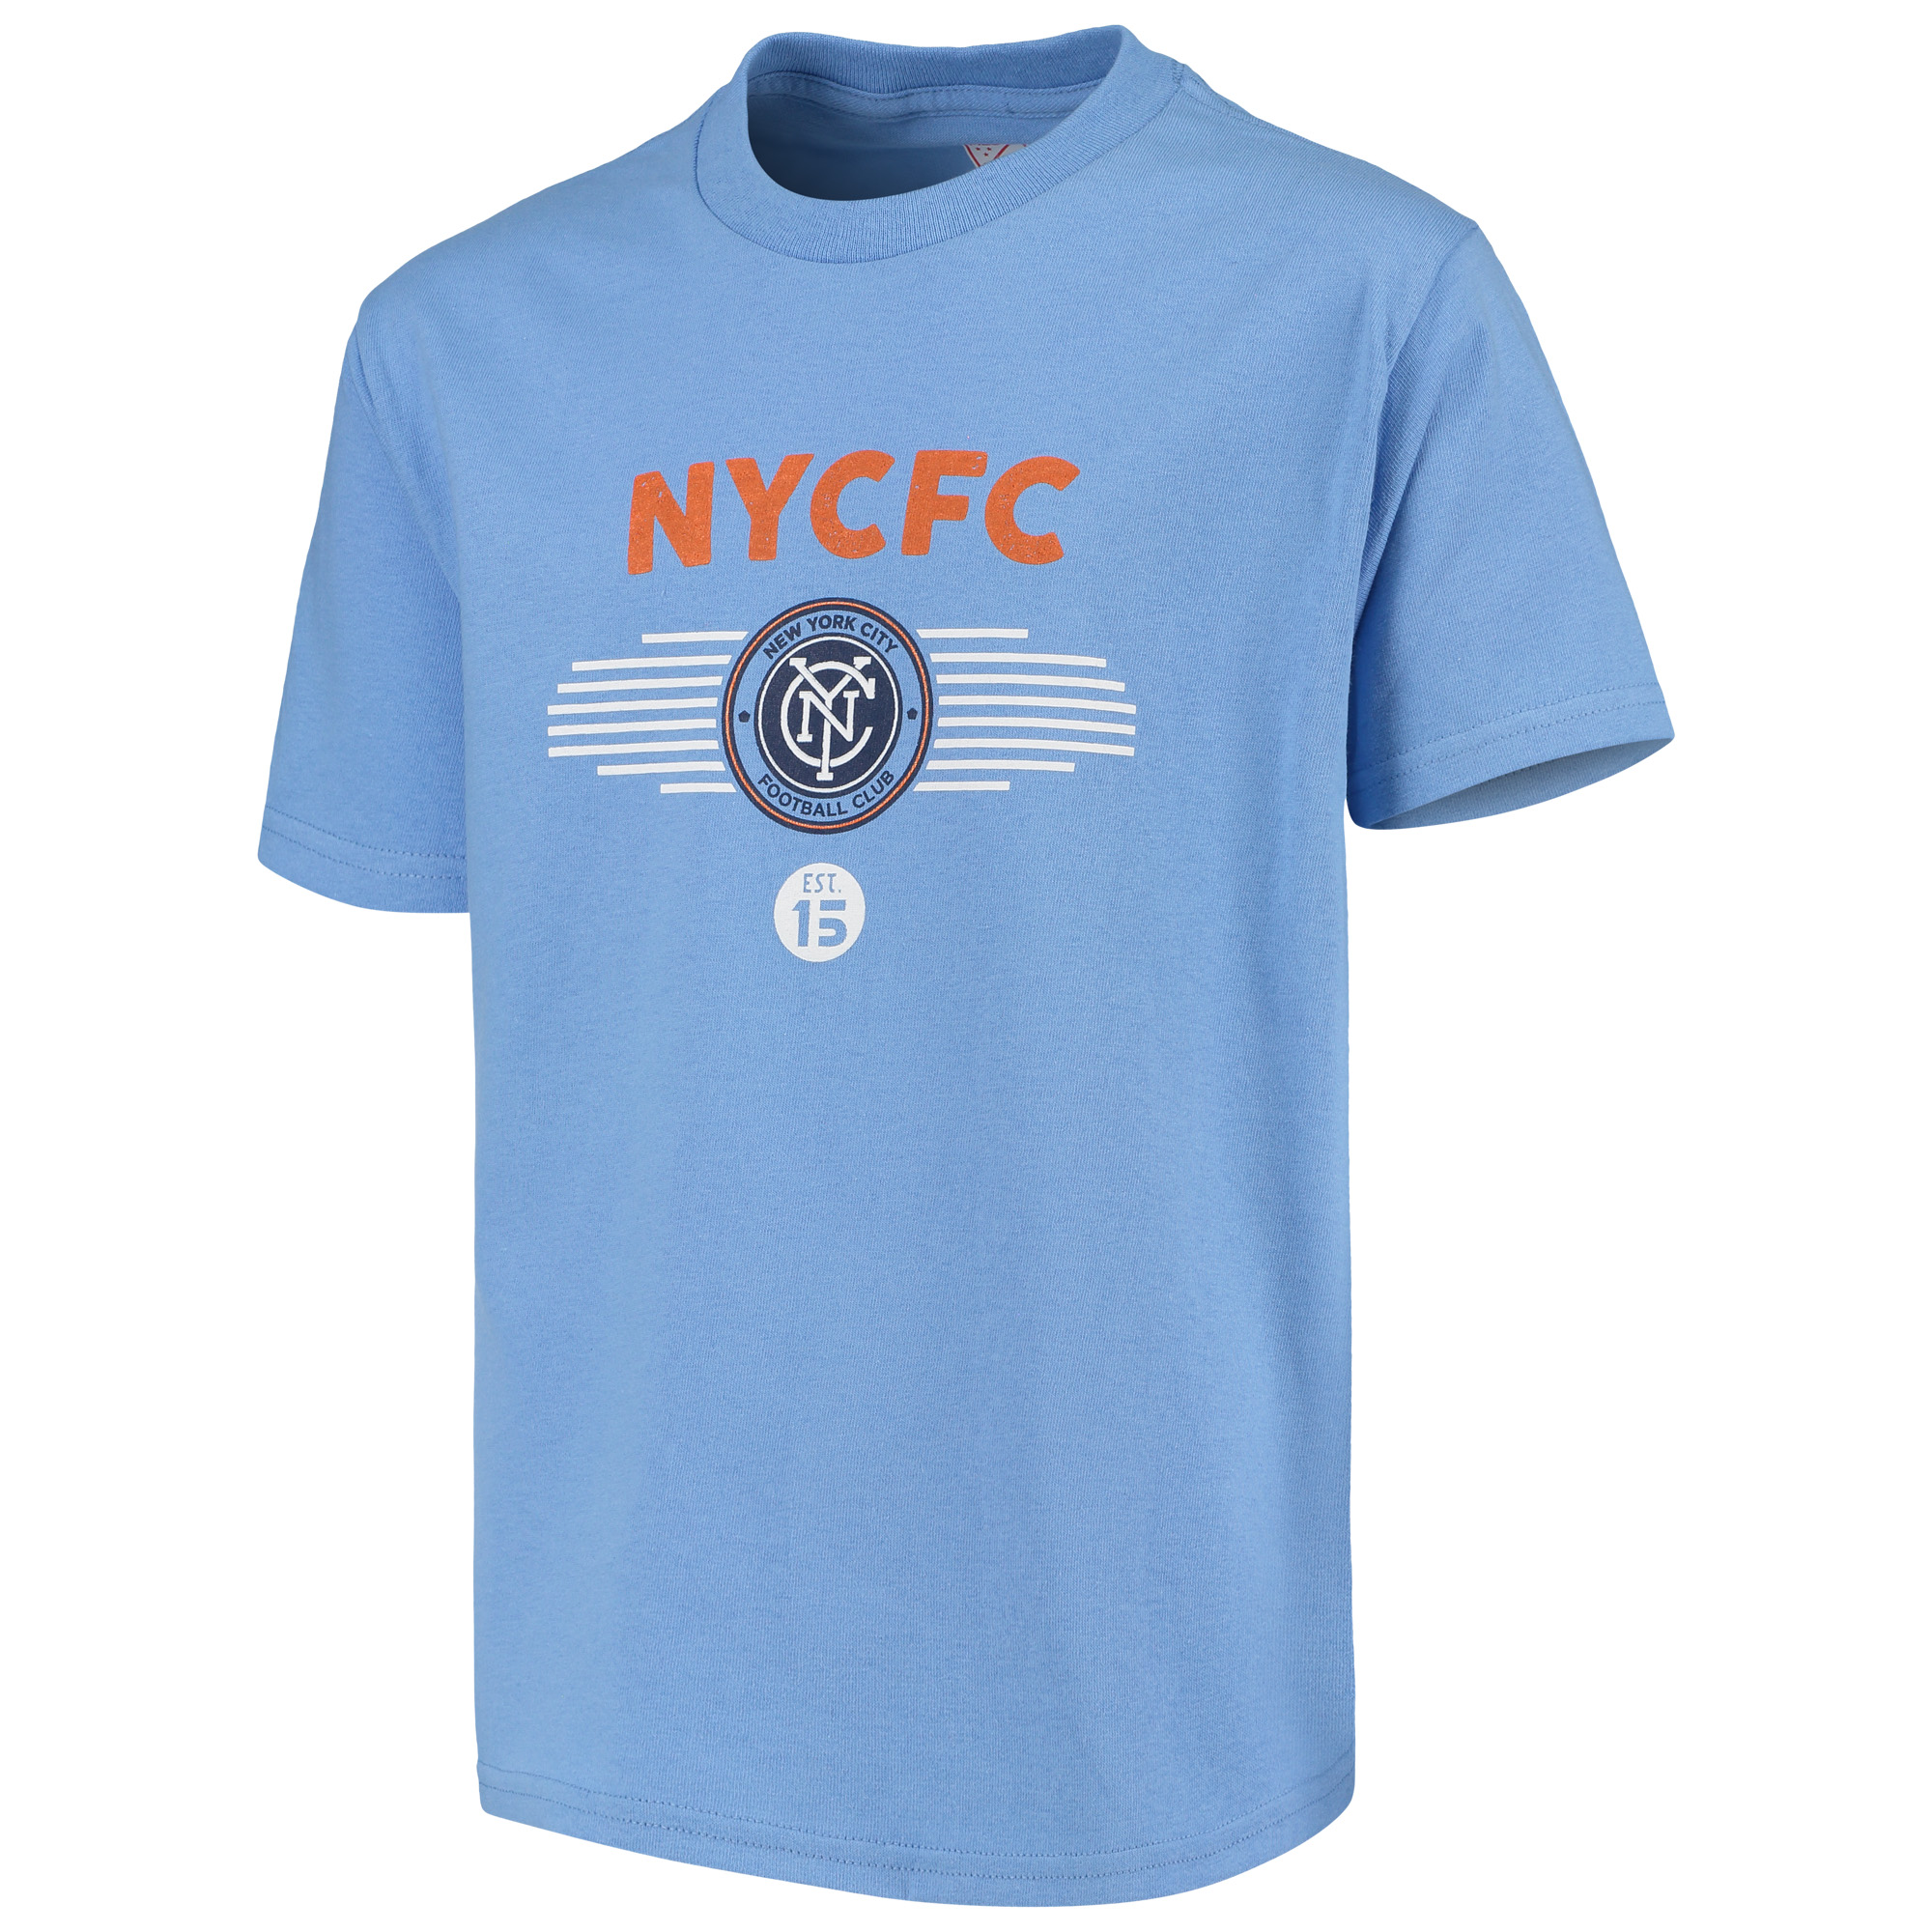 Youth Majestic Light Blue New York City FC Stunning Performance T-Shirt